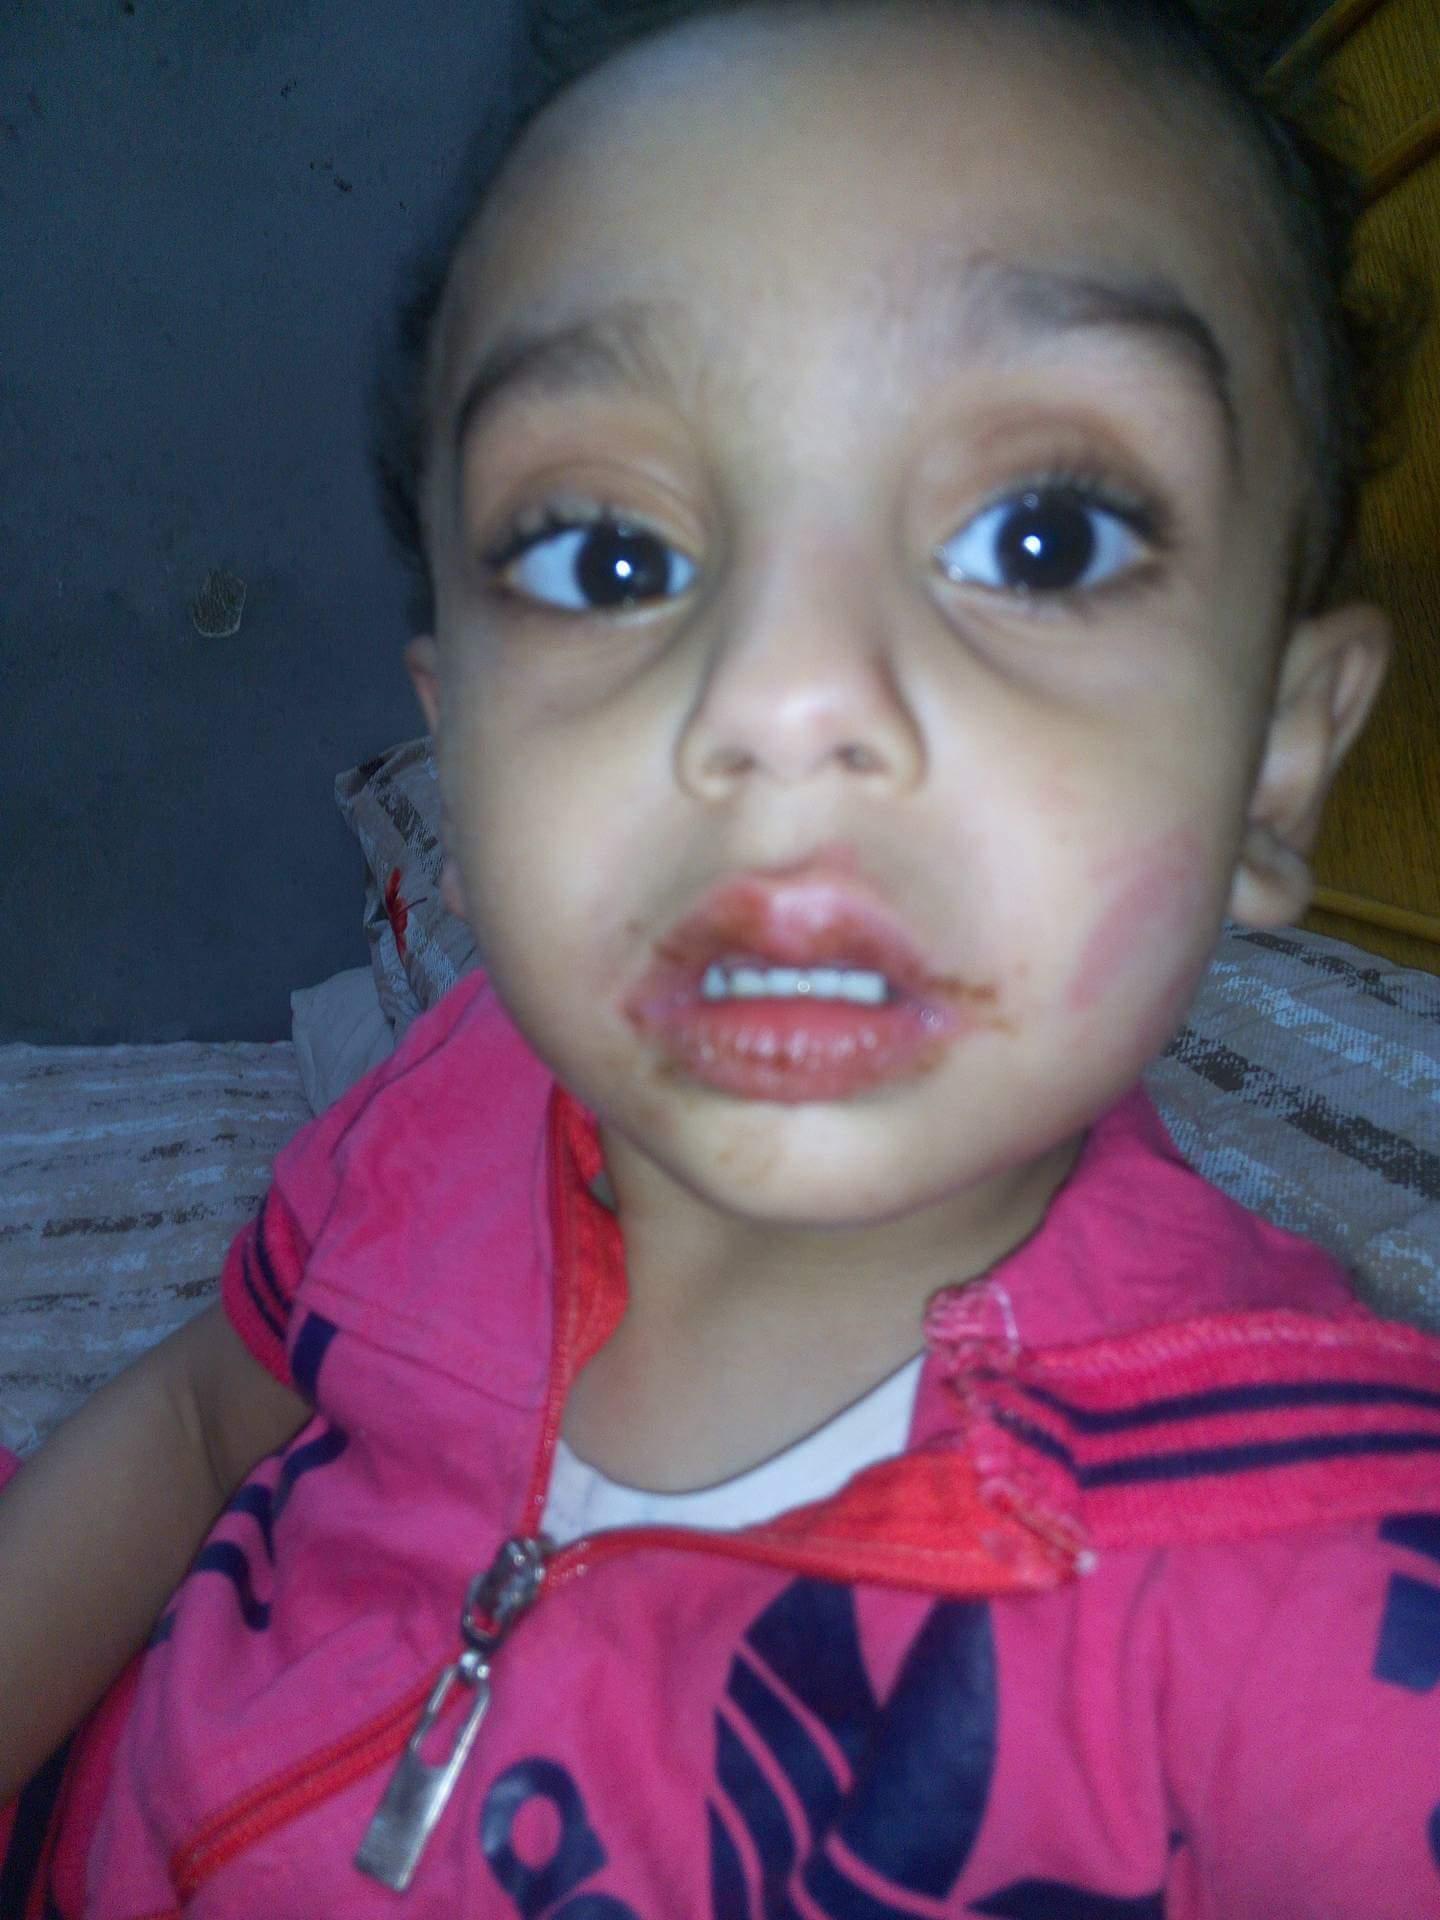 3115e322e الكاتب: sayed gamal. بلاغ يتهم صاحبة حضانة بتعذيب طفل وسحلة بالاسماعيلية